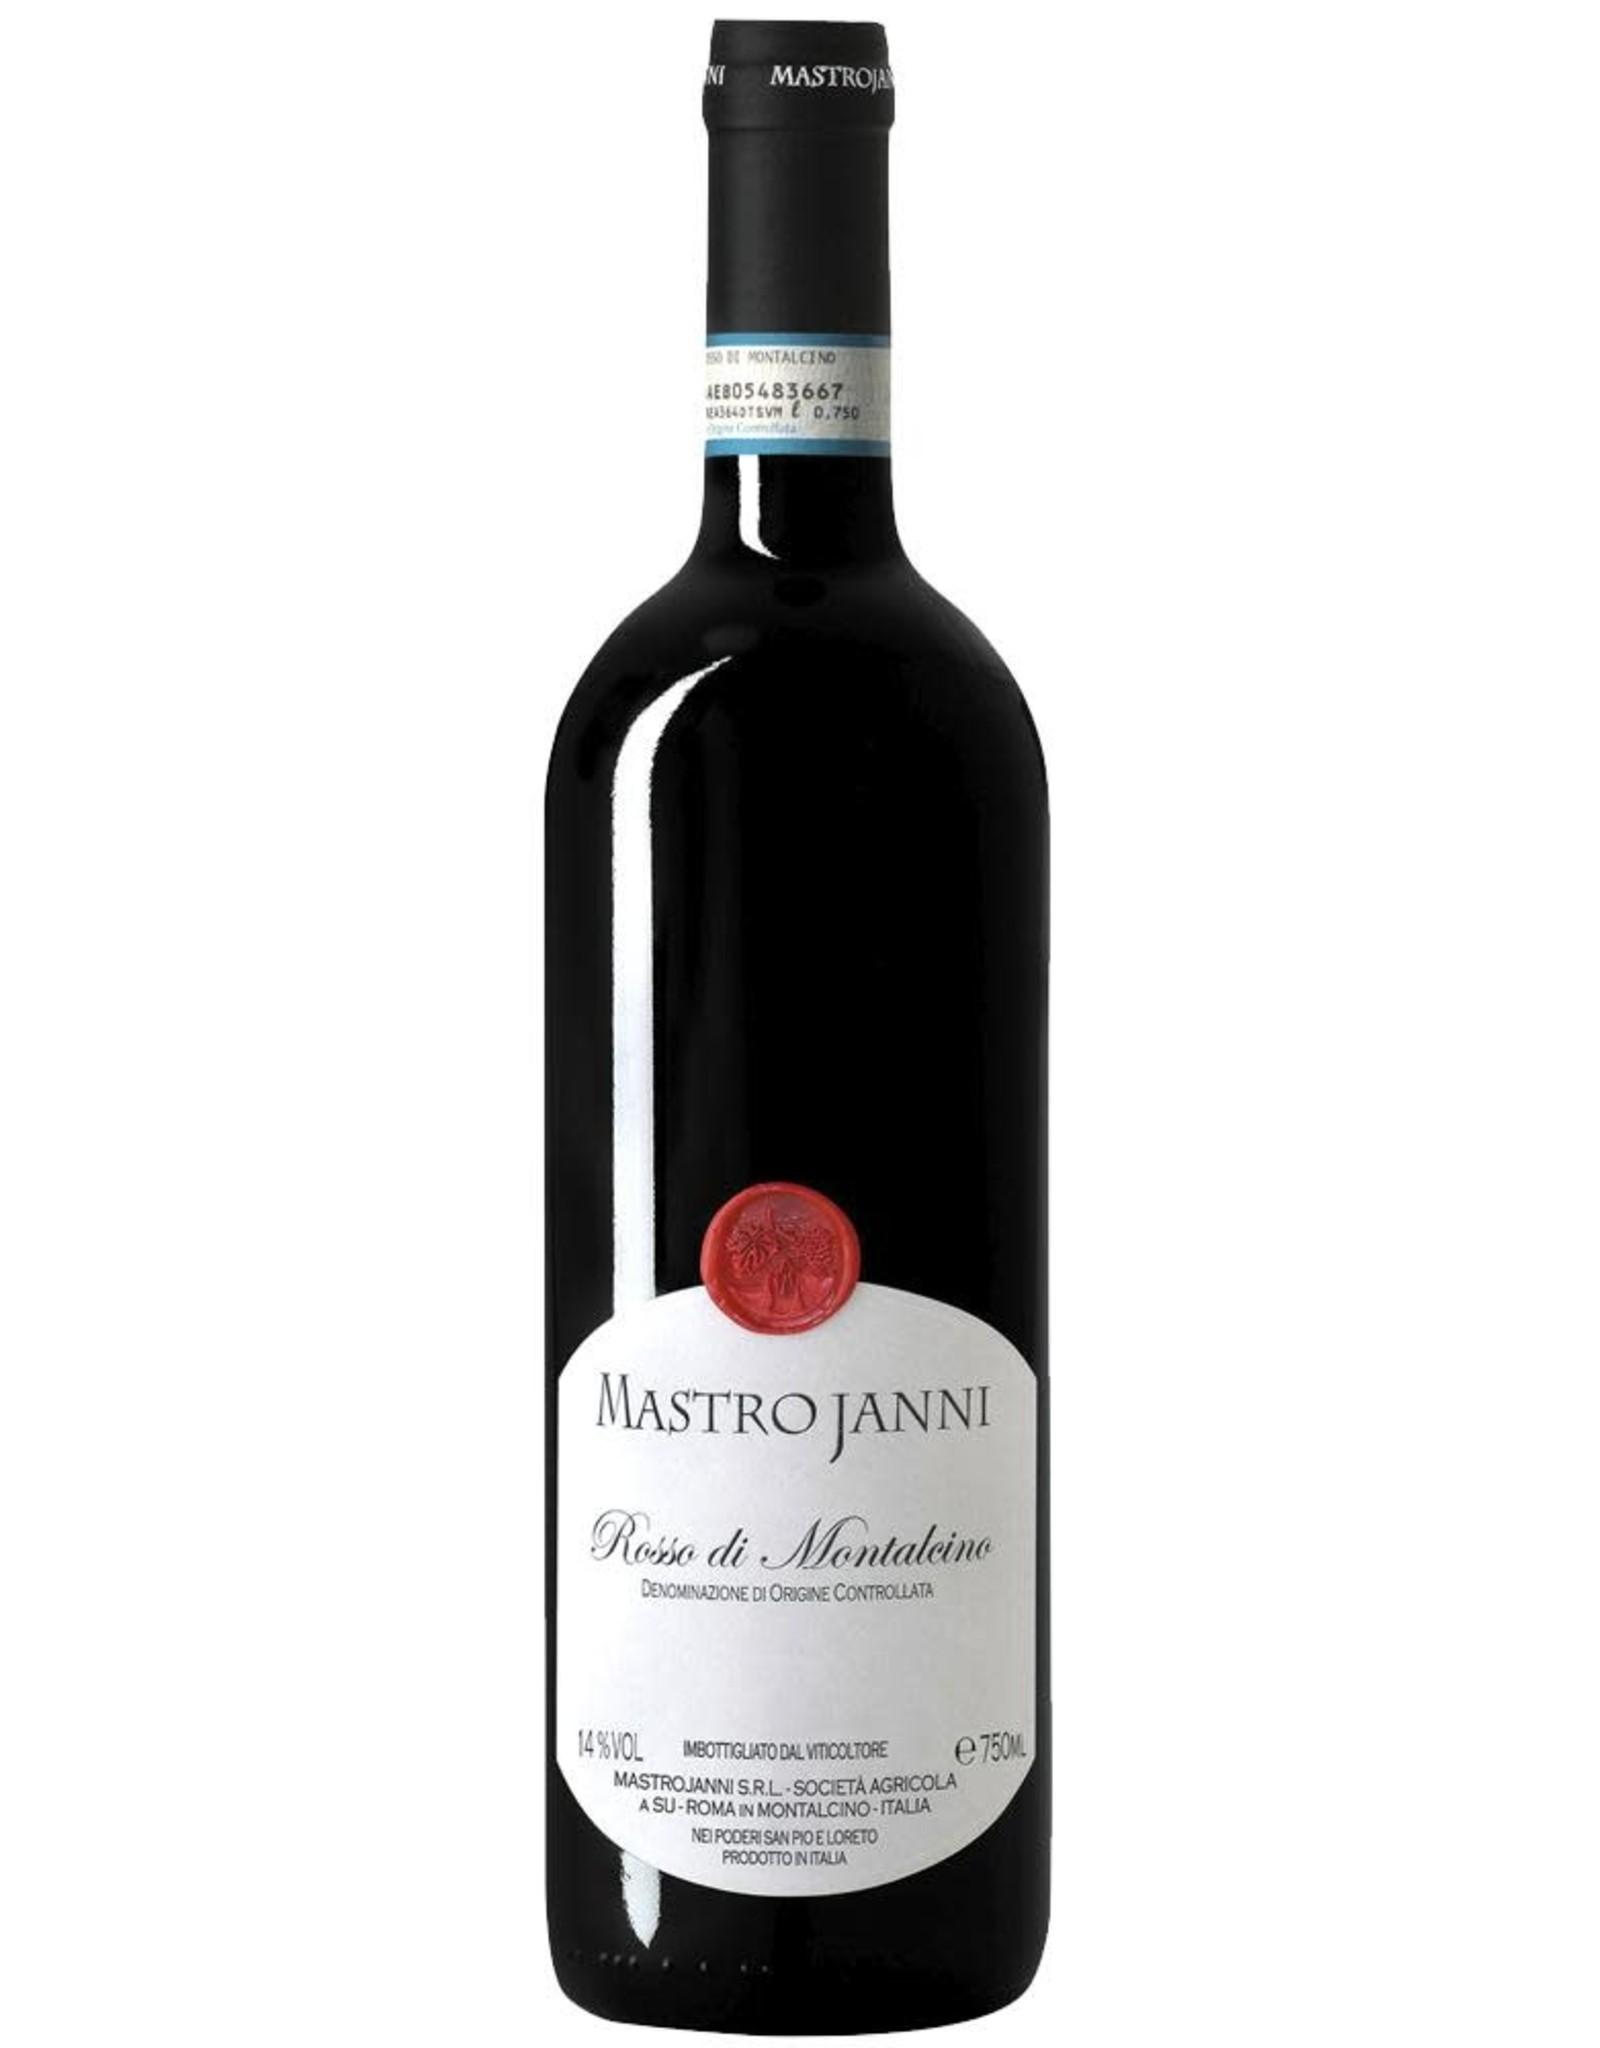 Mastro Janni Rosso 2017